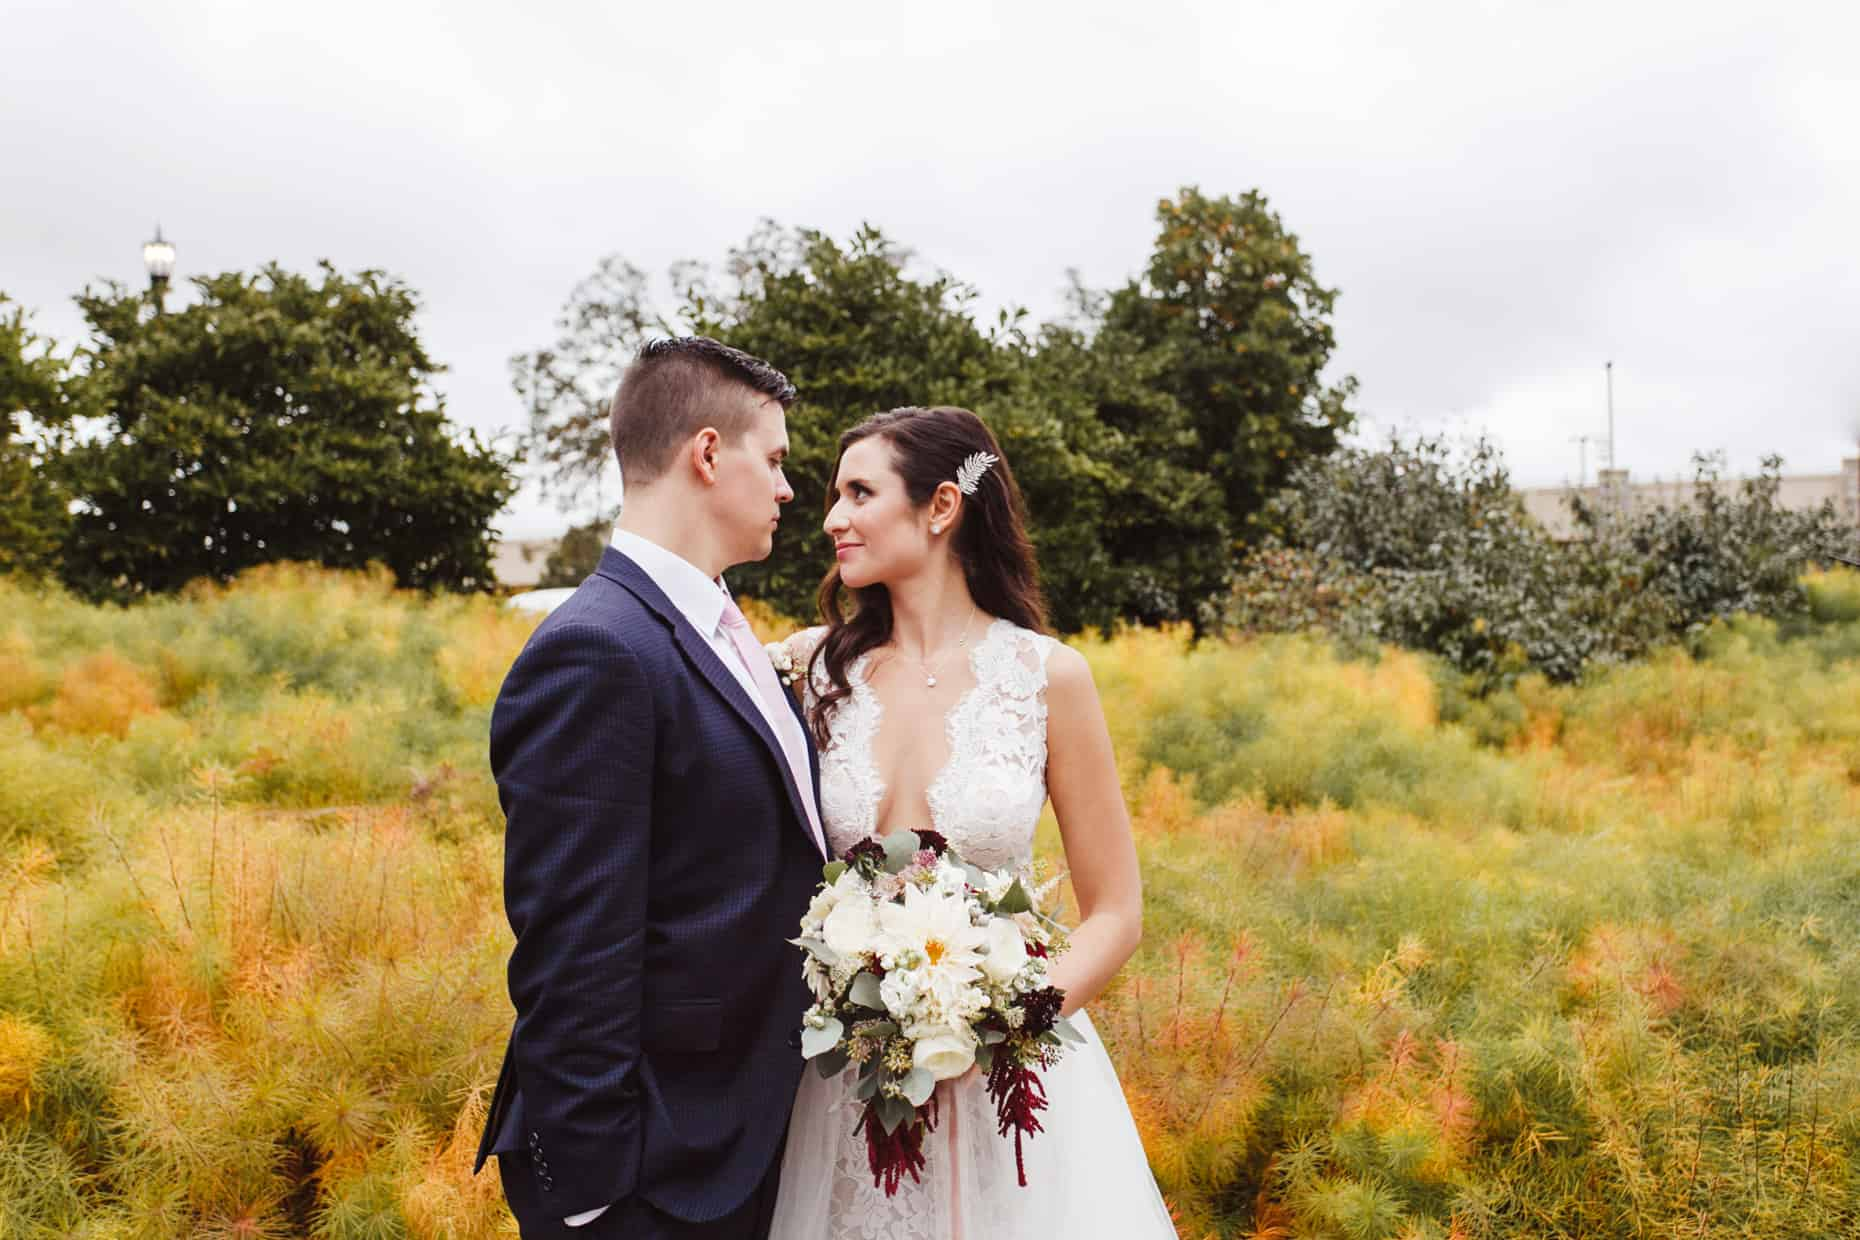 Philly wedding photographers